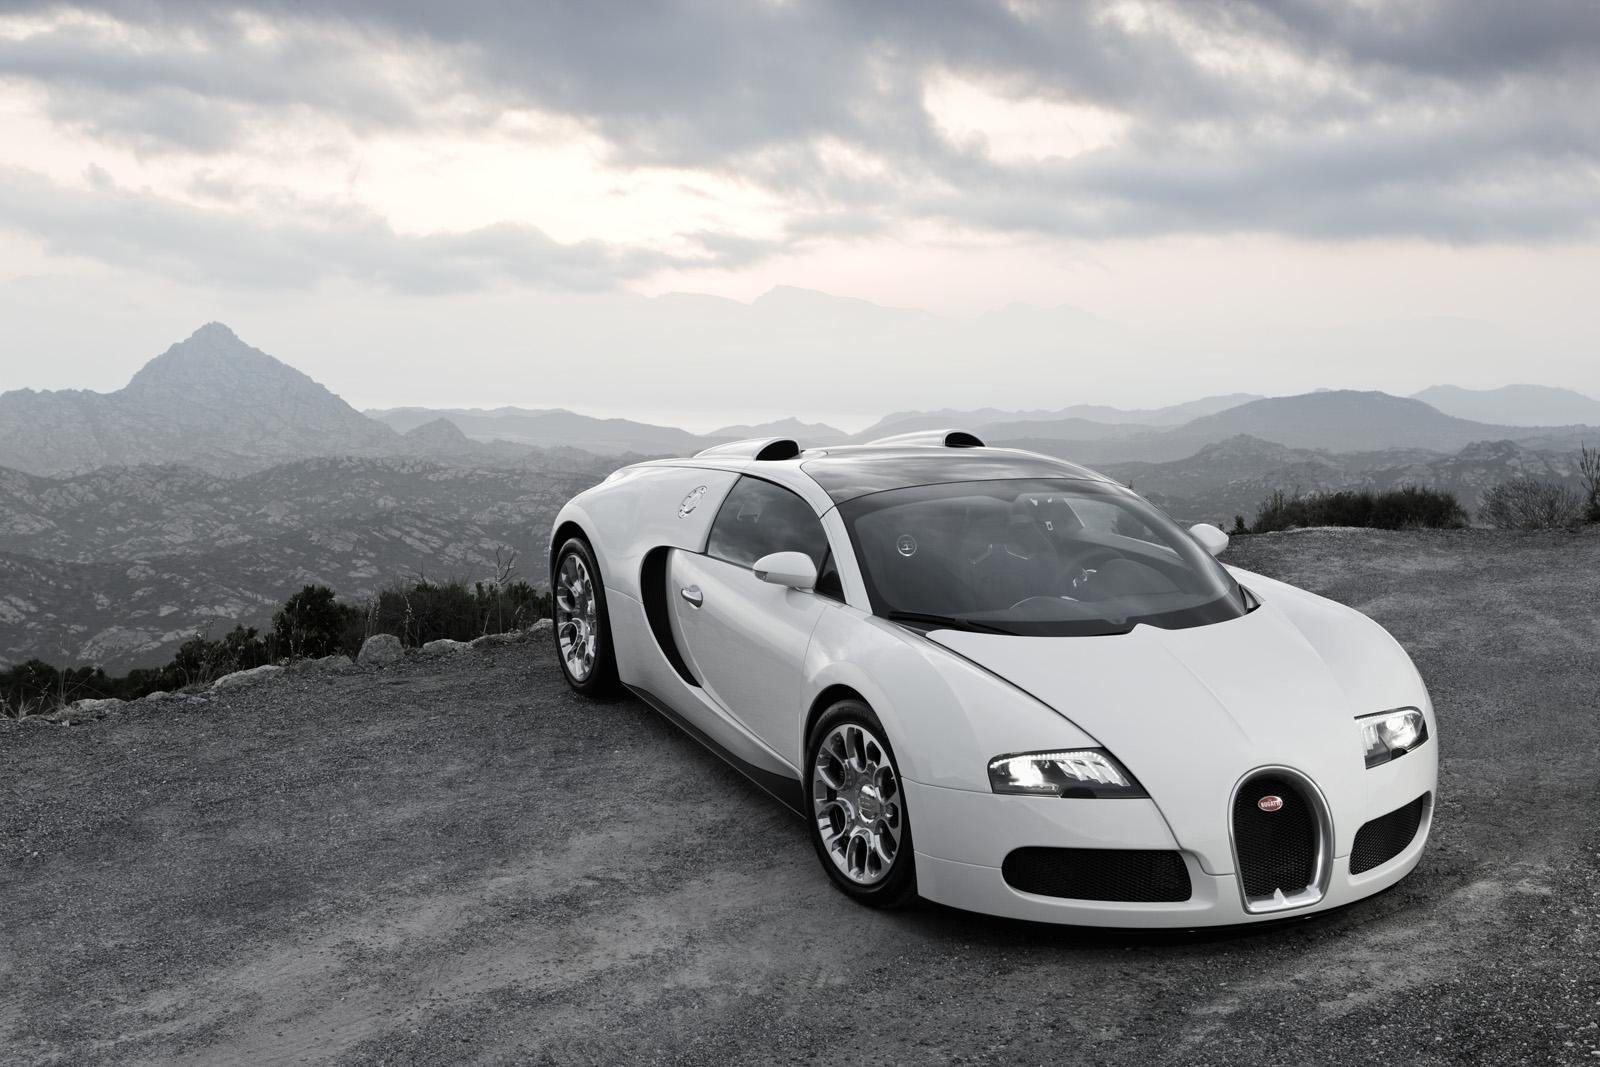 wallpaper world bugatti veyron 16 4 grand sport photos. Black Bedroom Furniture Sets. Home Design Ideas